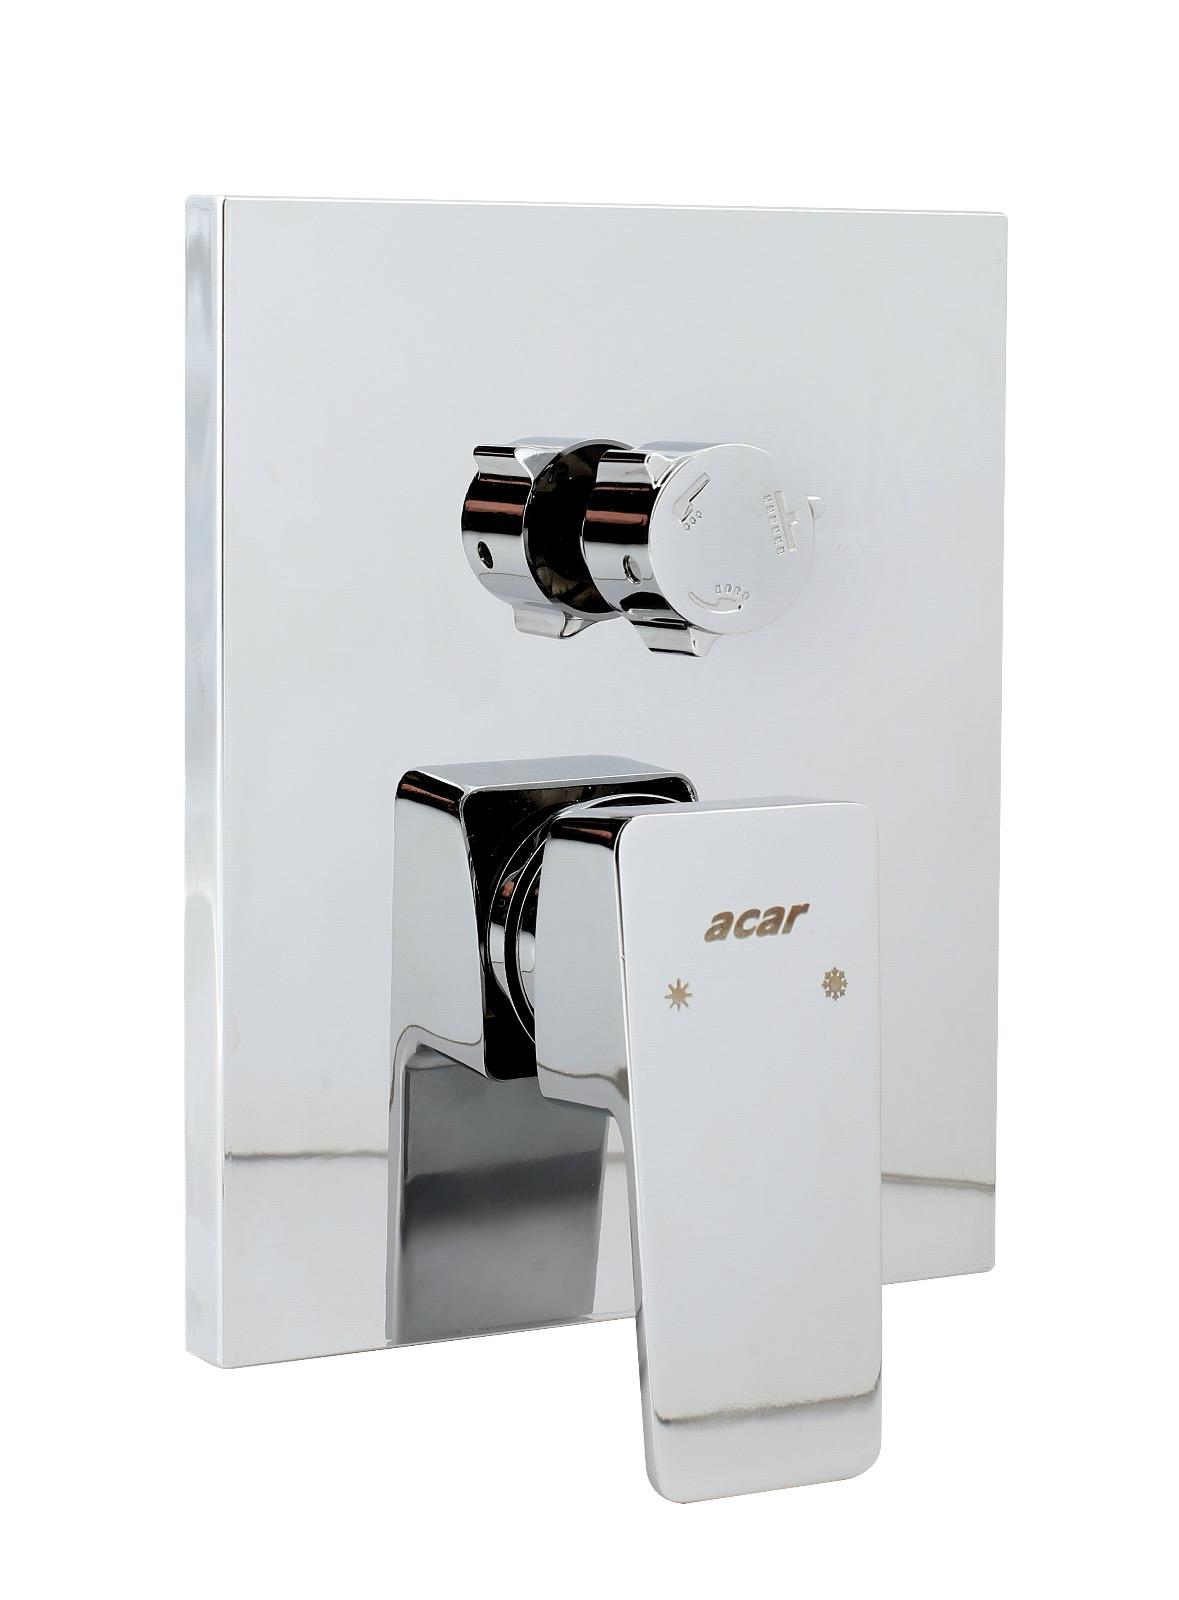 Safir Built-in Bathroom Faucet